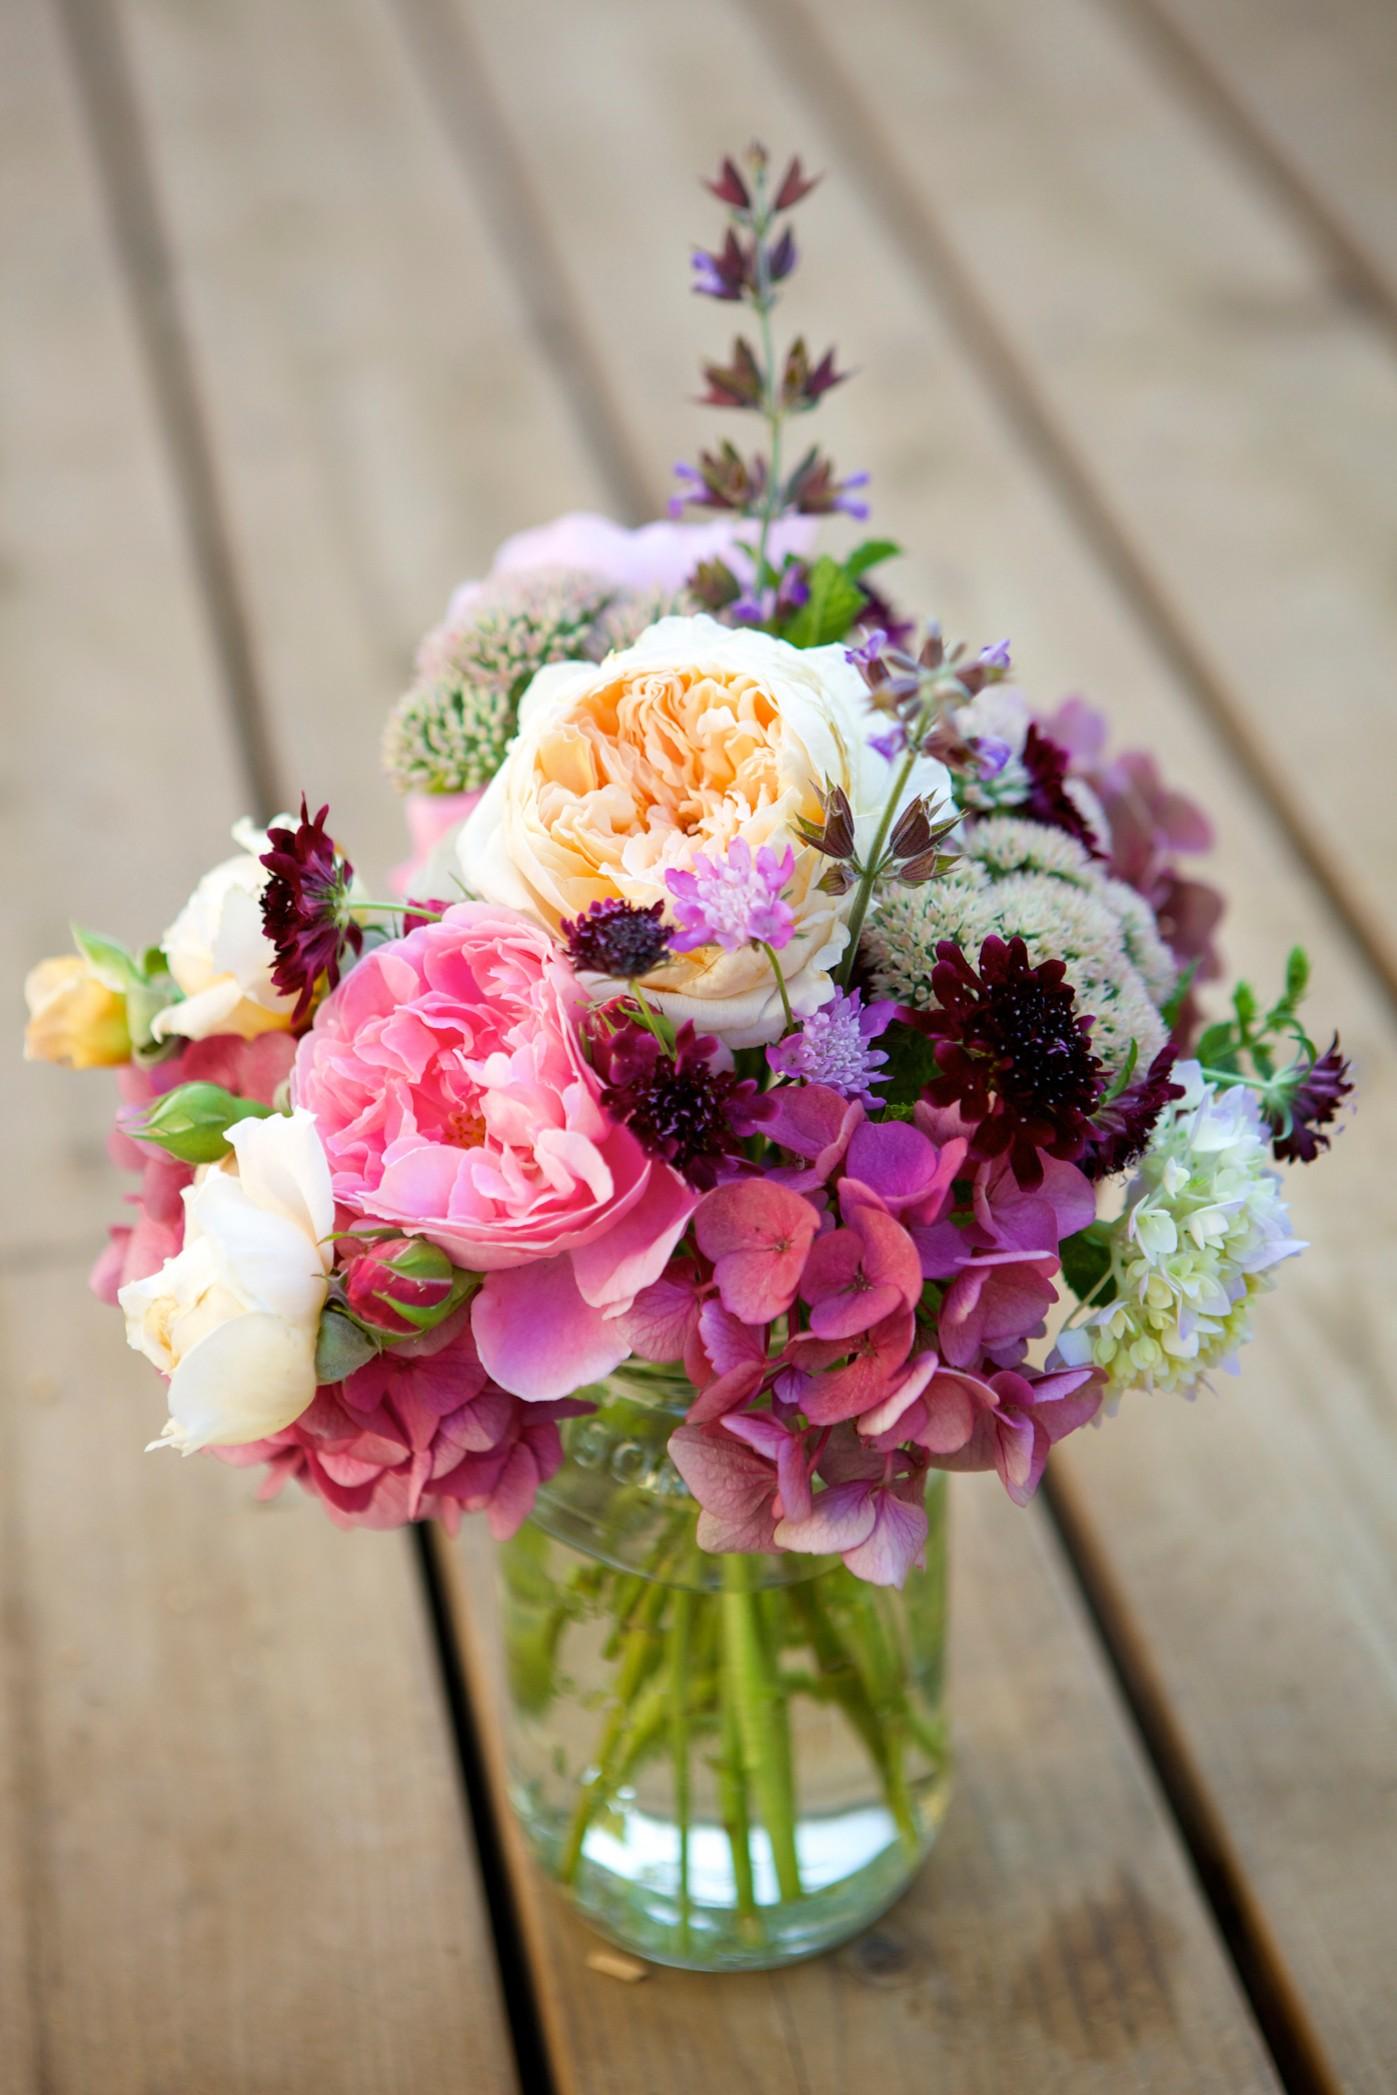 design your own floral arrangement online  35 Floral Arrangement Ideas - Creative DIY Flower Arrangements - design your own floral arrangement online